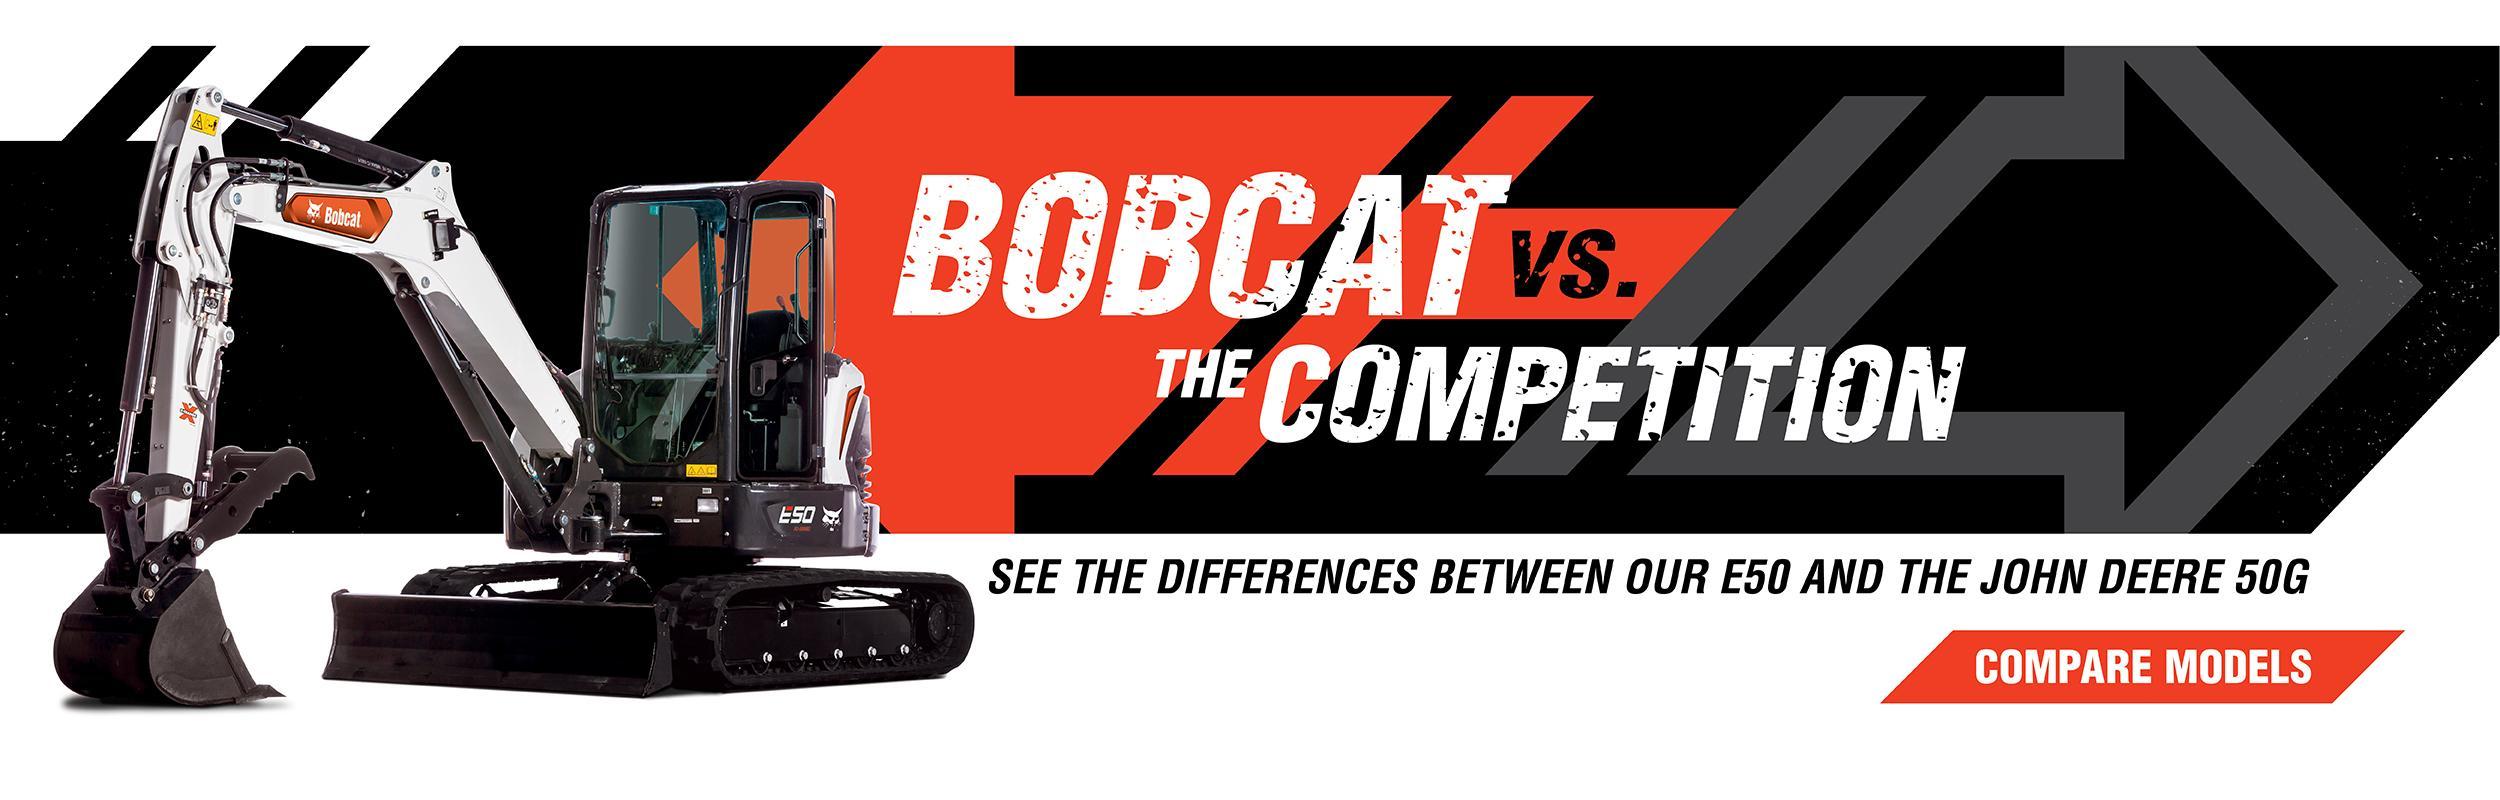 Bobcat E50 Mini Excavator Vs. John Deere 50G Compare Models Banner